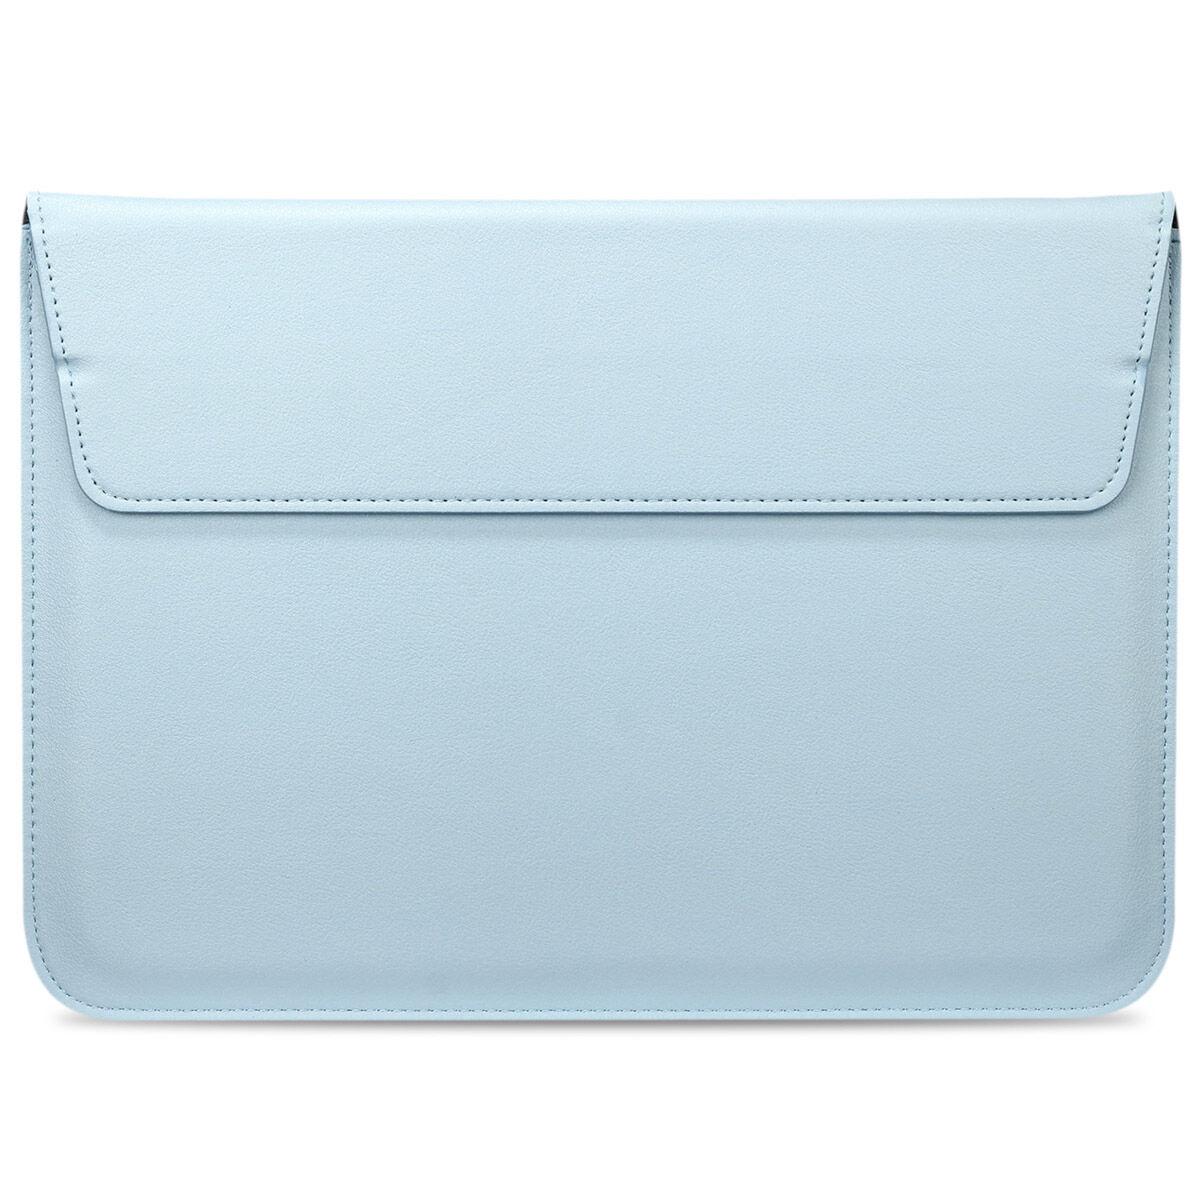 iMoshion Vegan Lederen Laptop Sleeve 15 pouces - Bleu clair